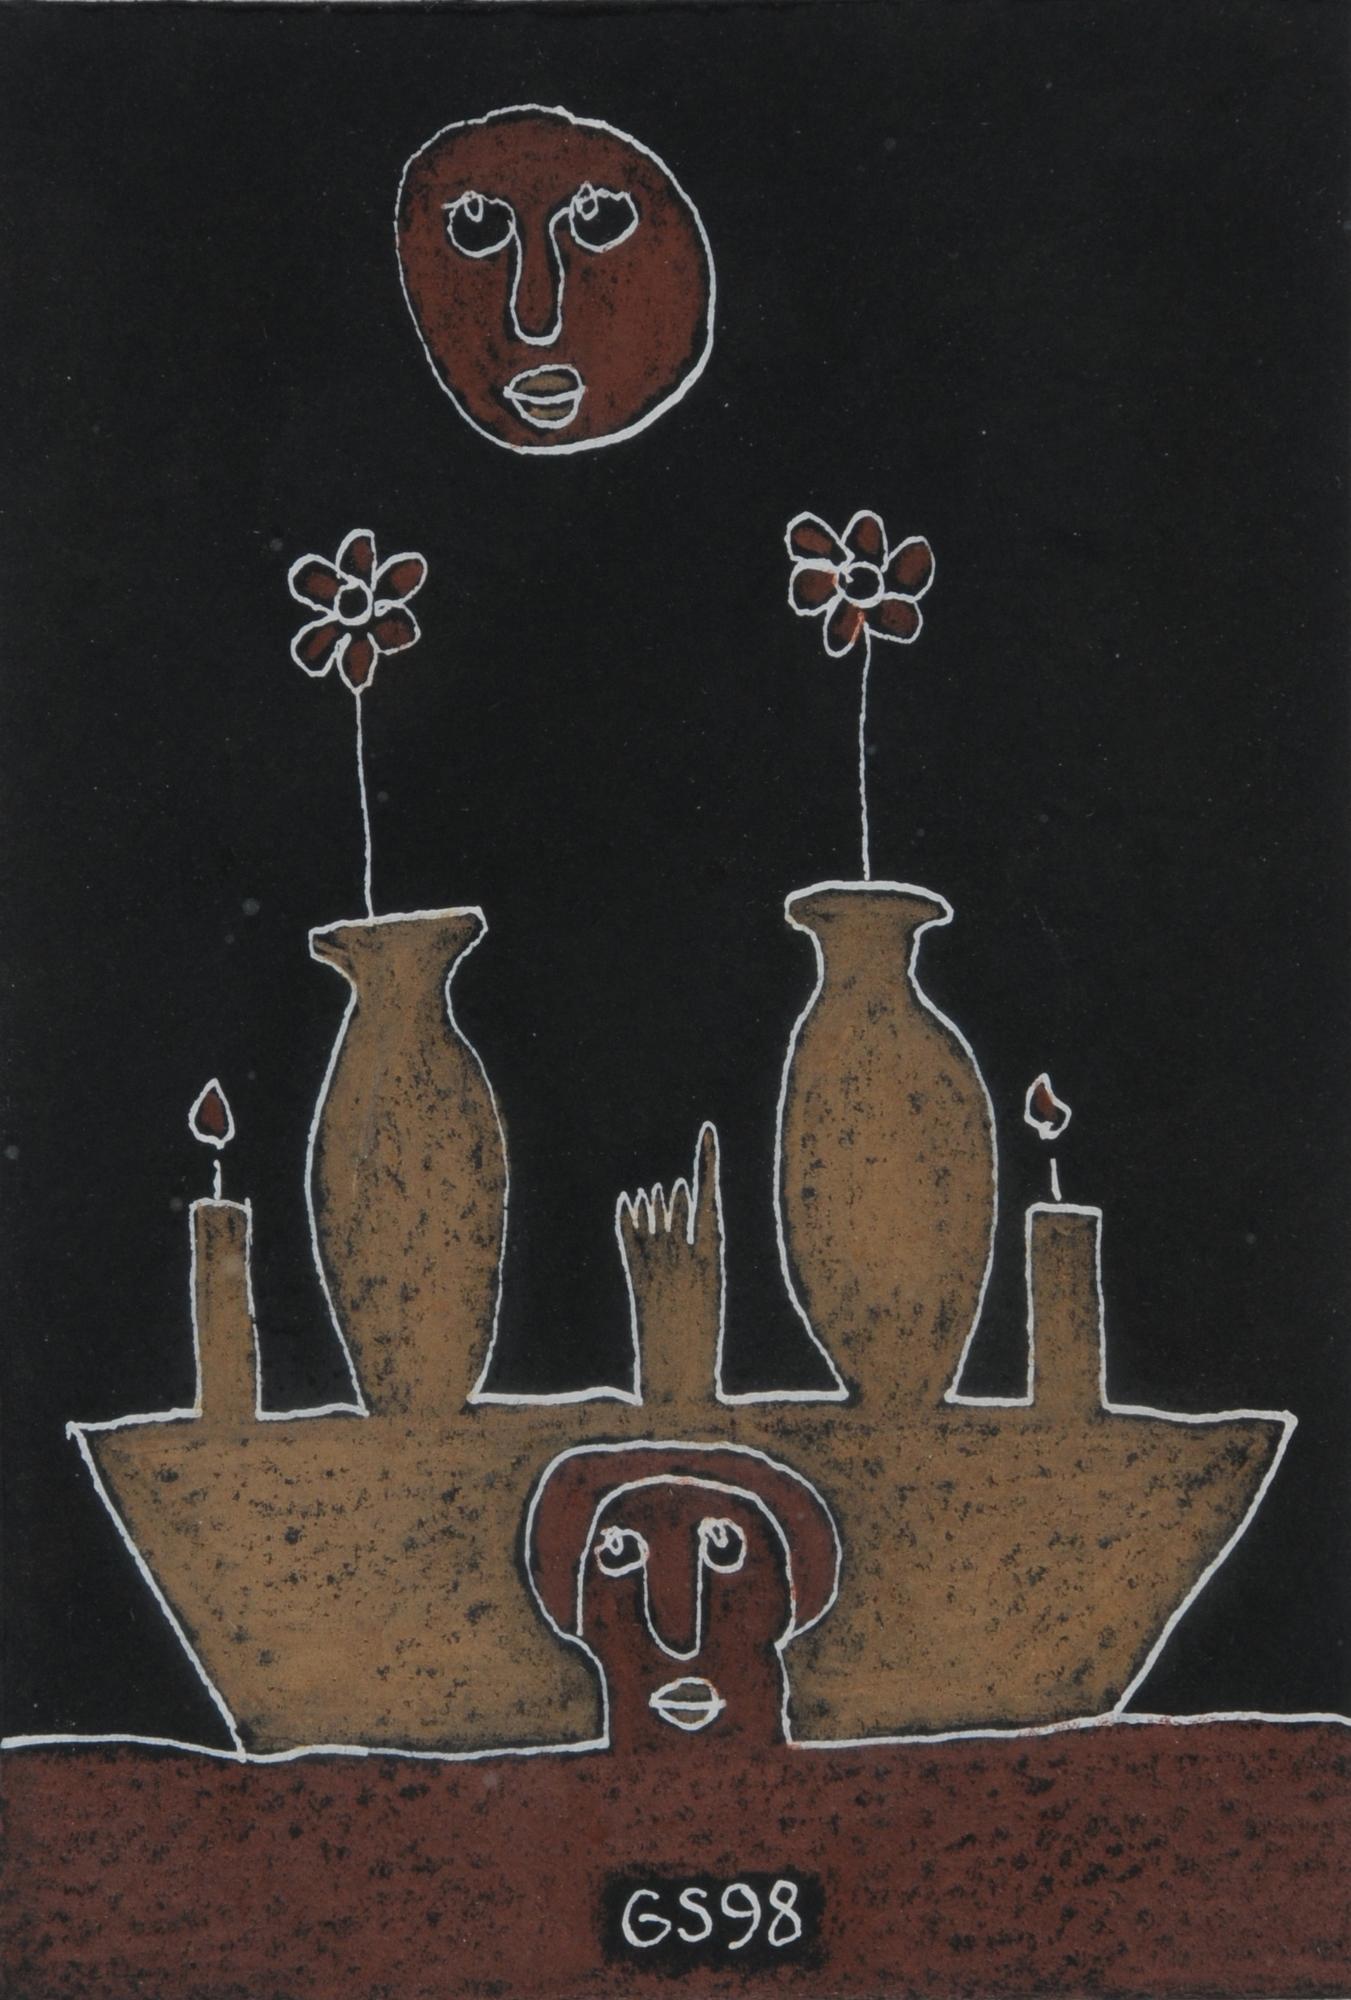 Sendrey Gérard, 3 drawings: Composition